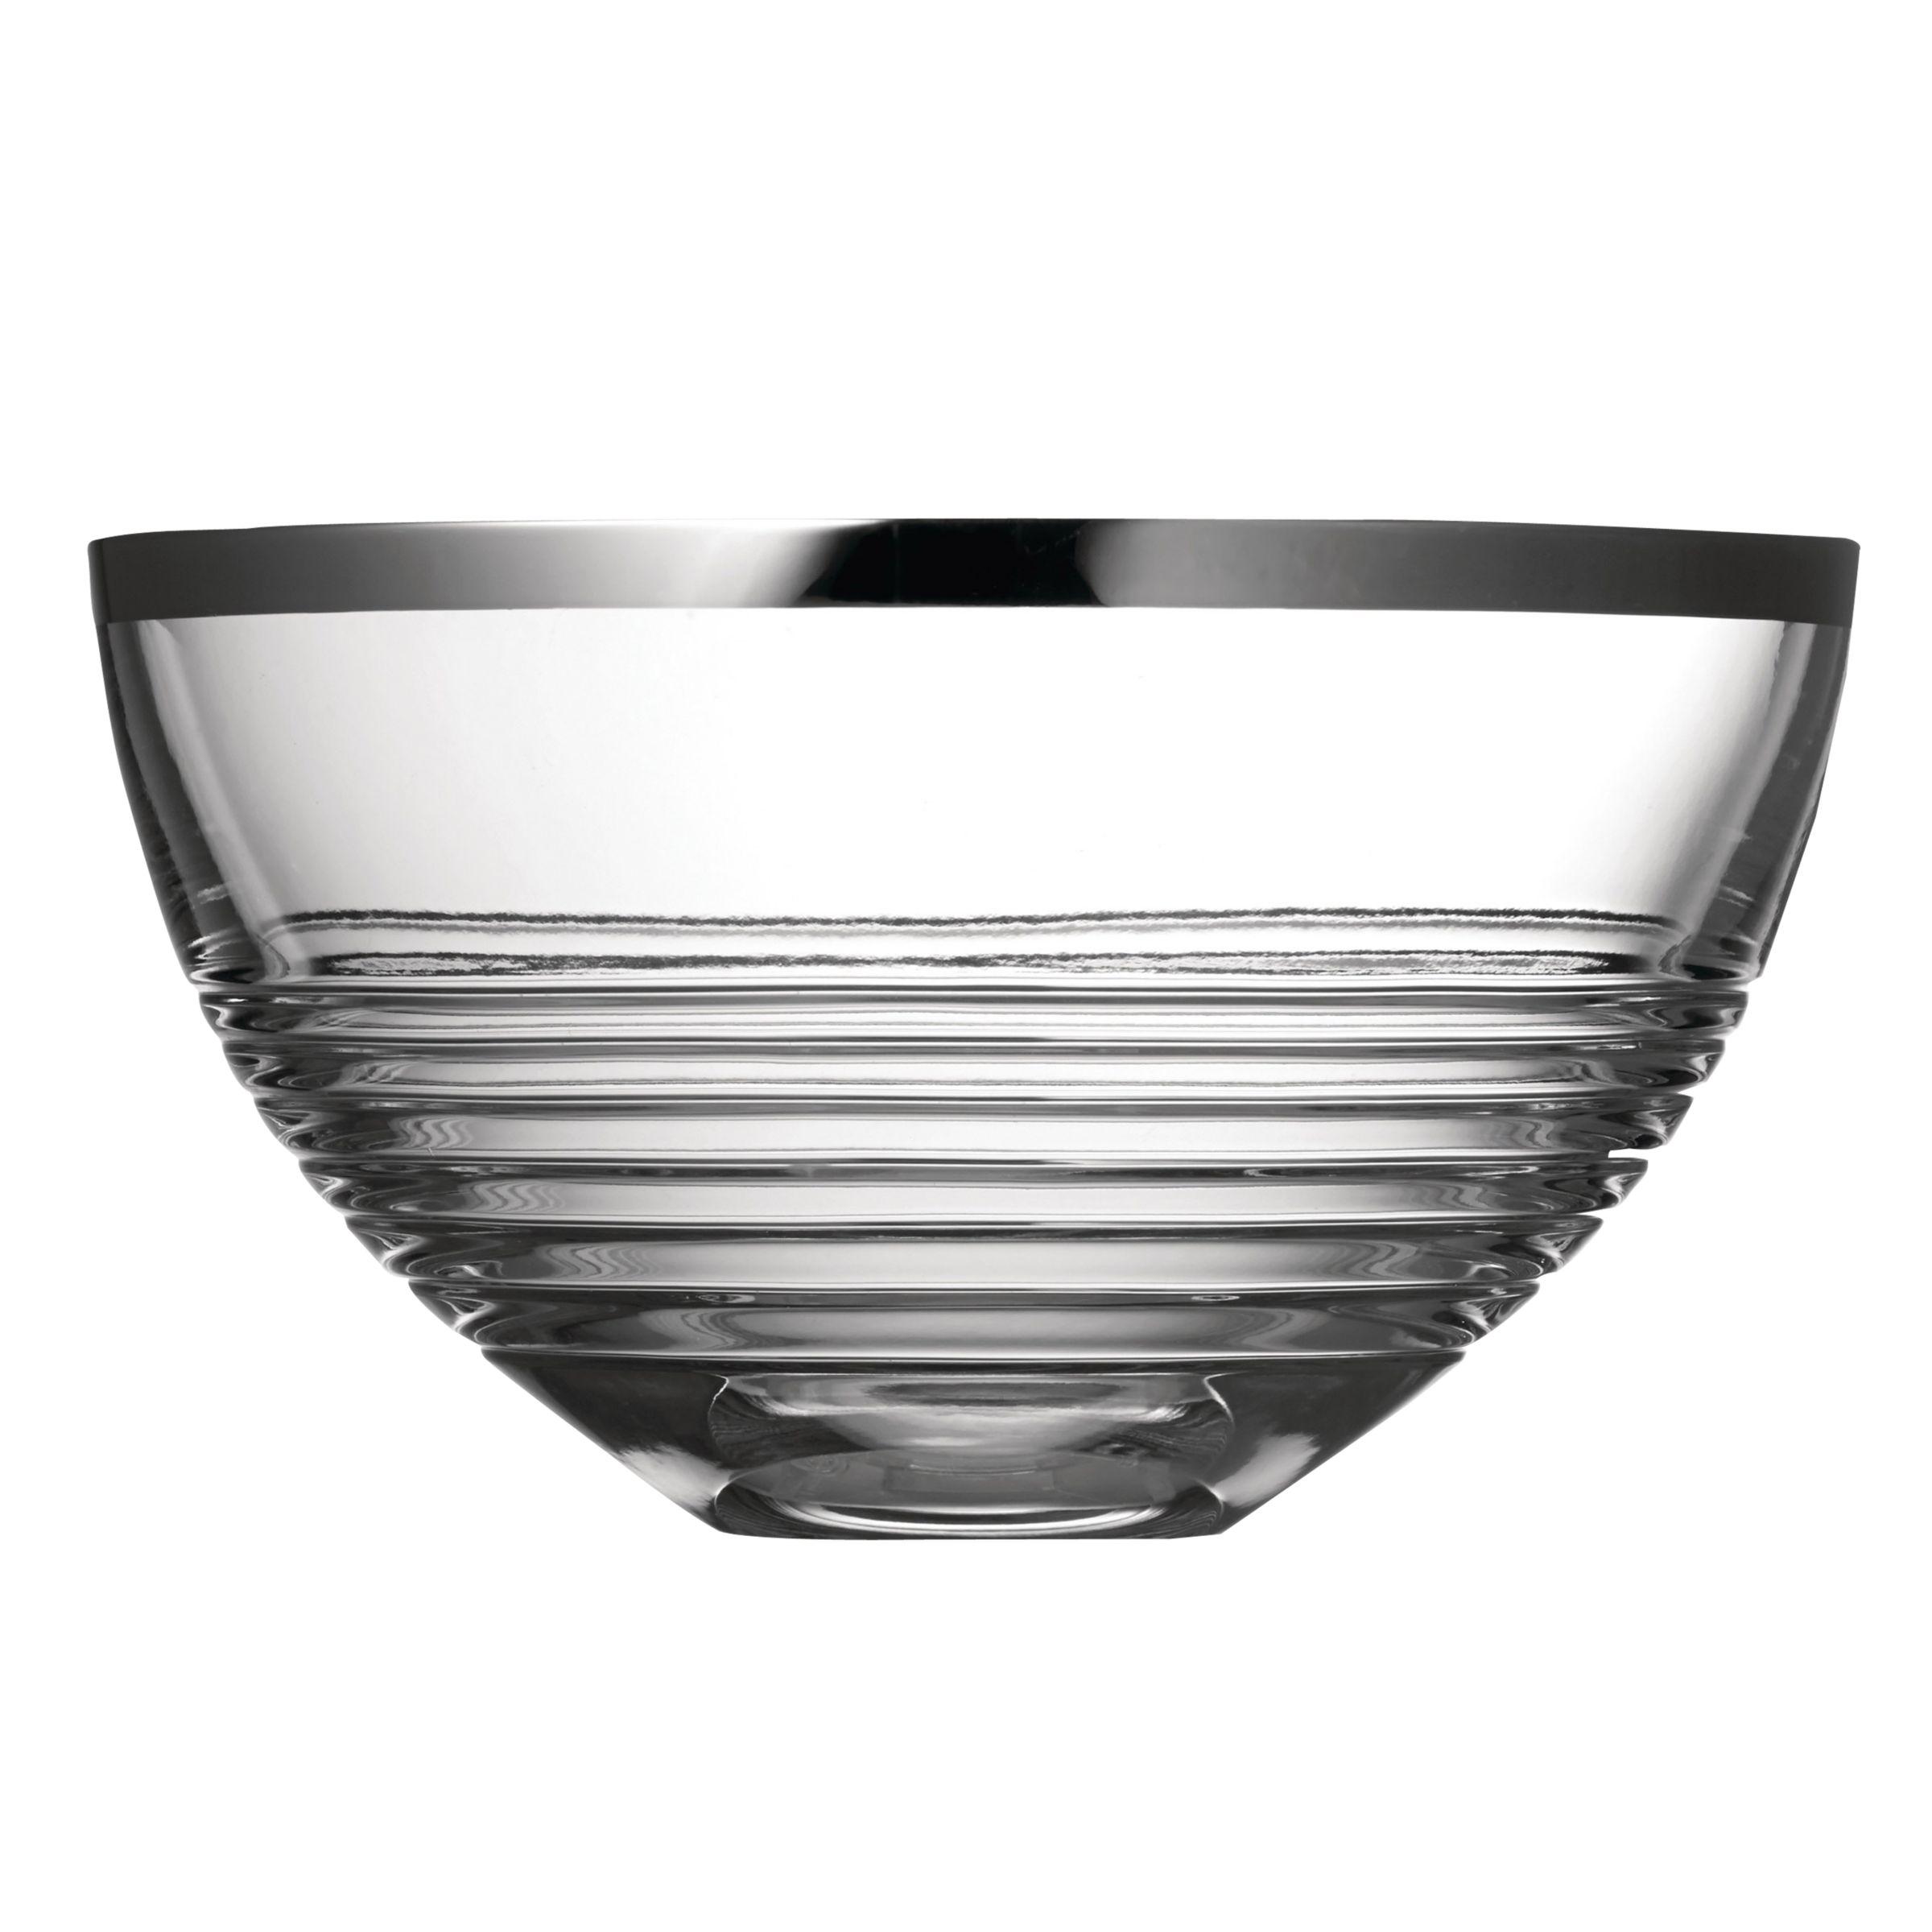 Wedgwood Vera Wang for Wedgwood Grosgrain Nouveau 10 Bowl